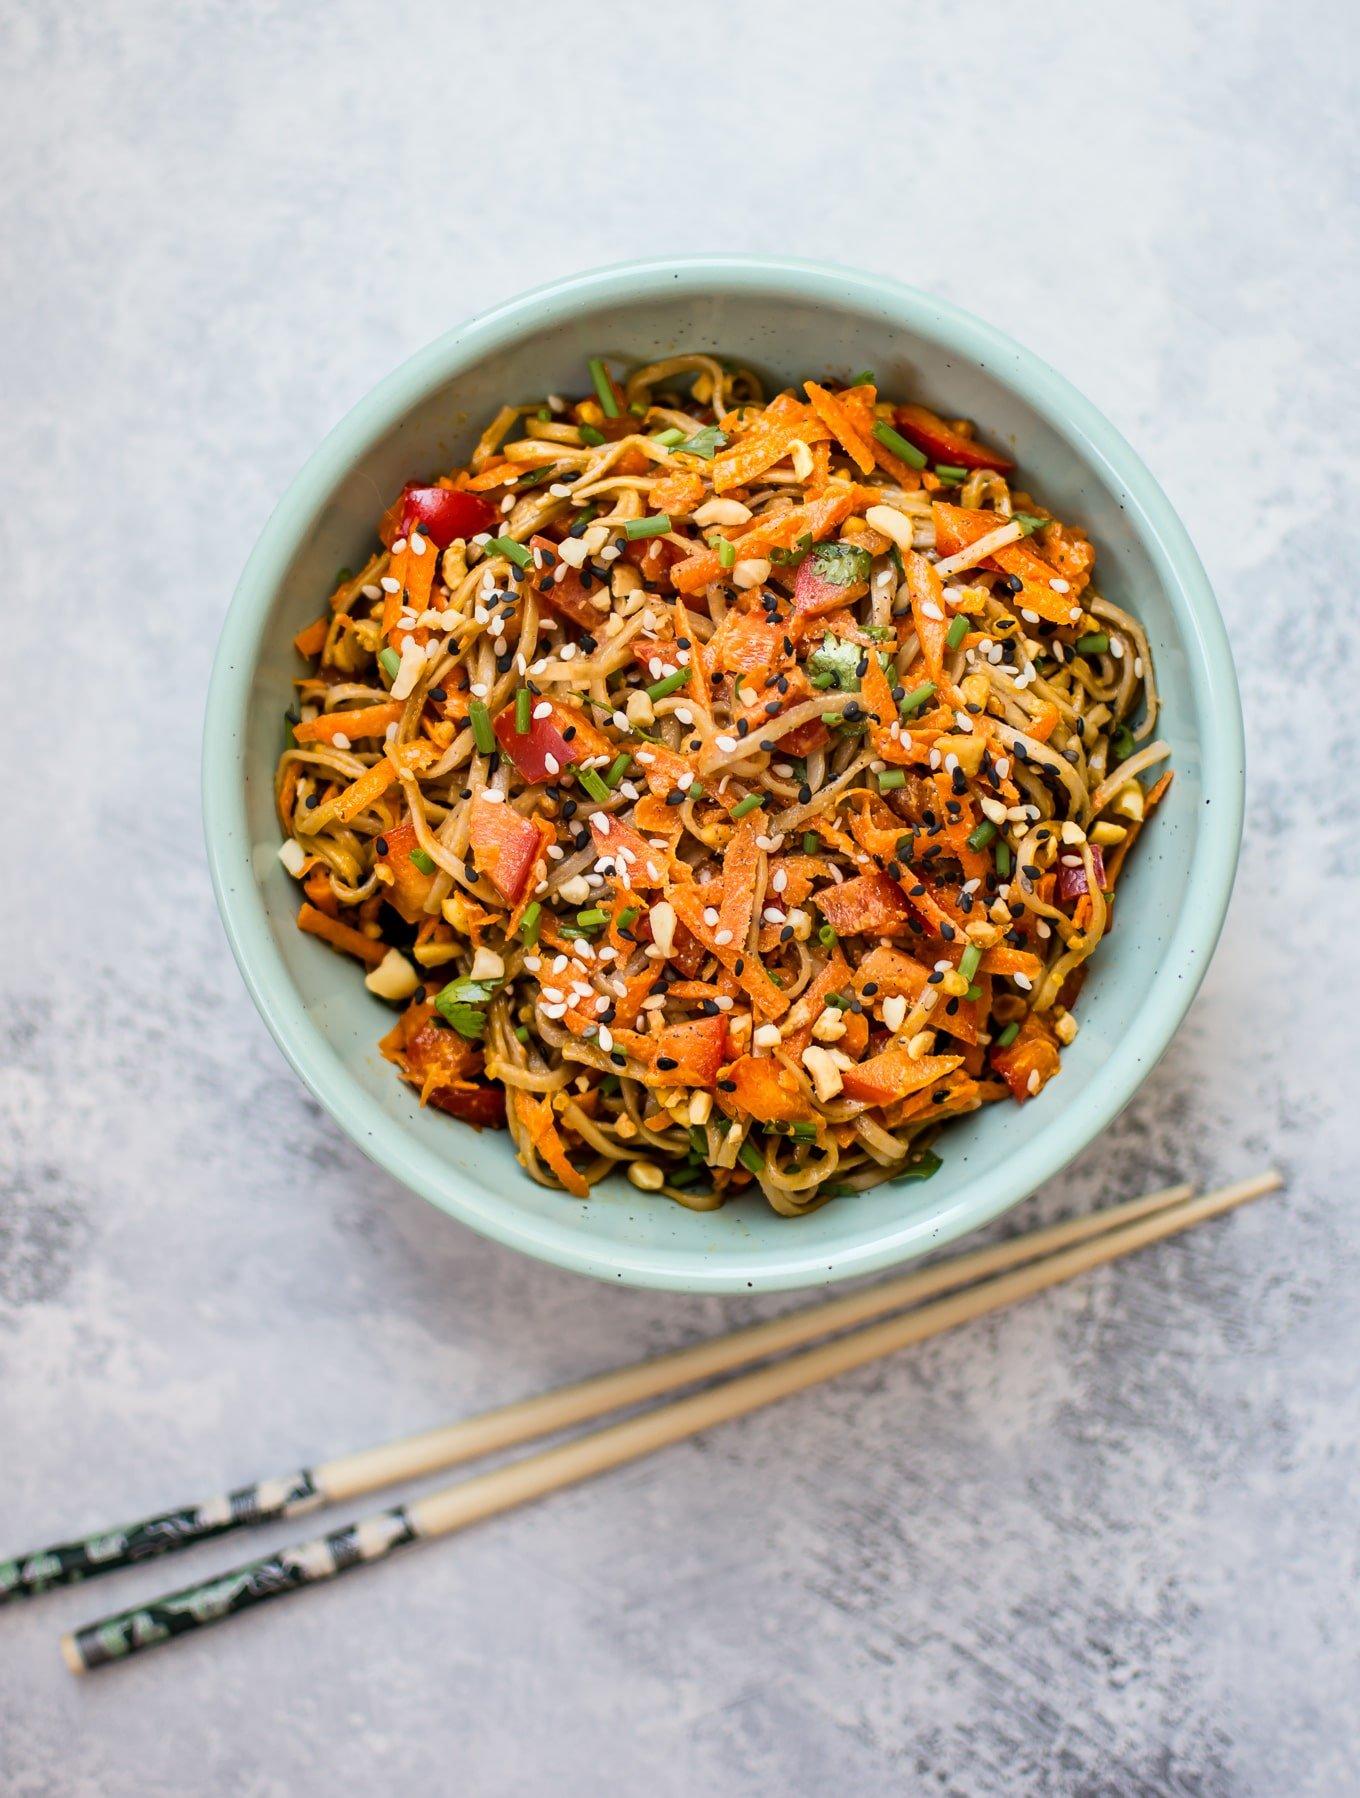 cold soba noodle salad with a spicy peanut sauce • salt